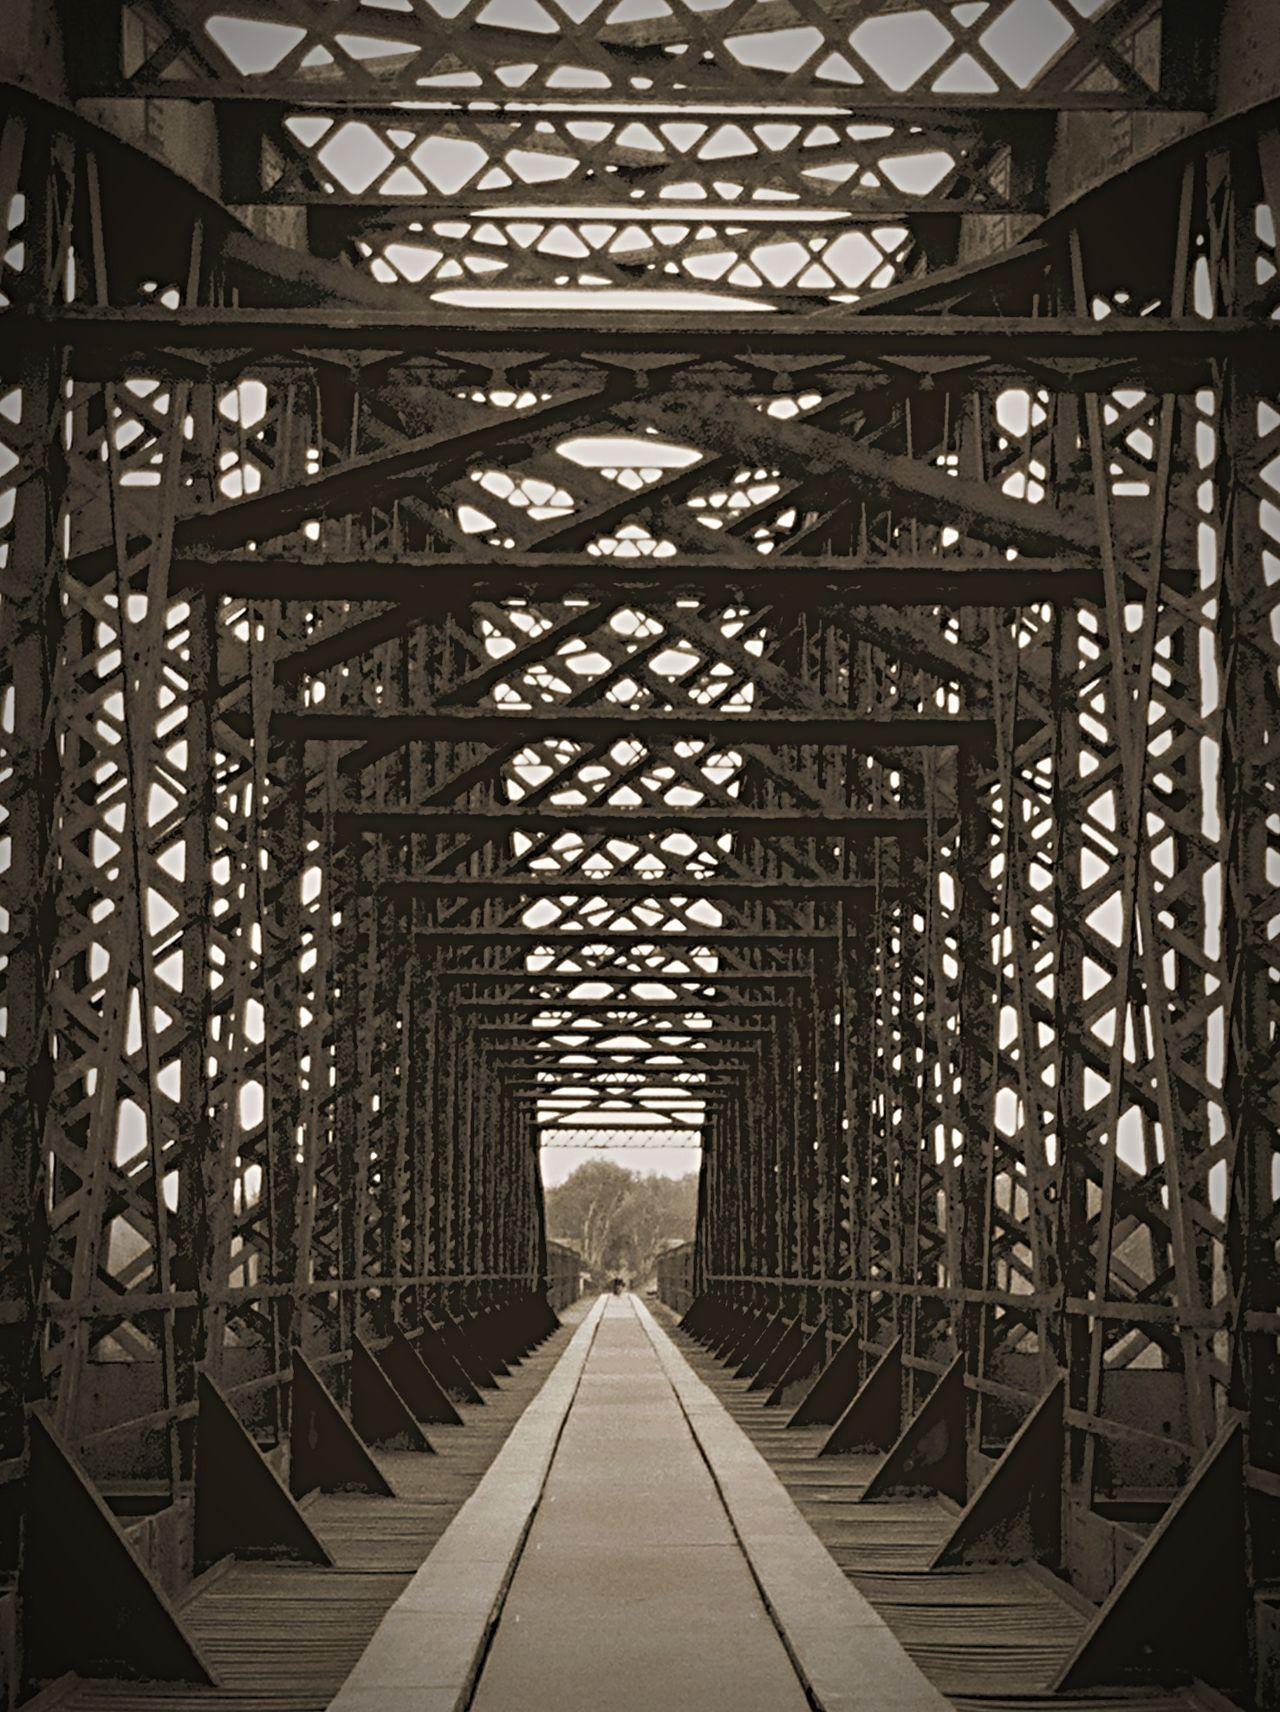 Bridge Spey Bay Blackandwhite Monochrome Garmouth Steel Structures Old Railway Bridge River Spey Black And White